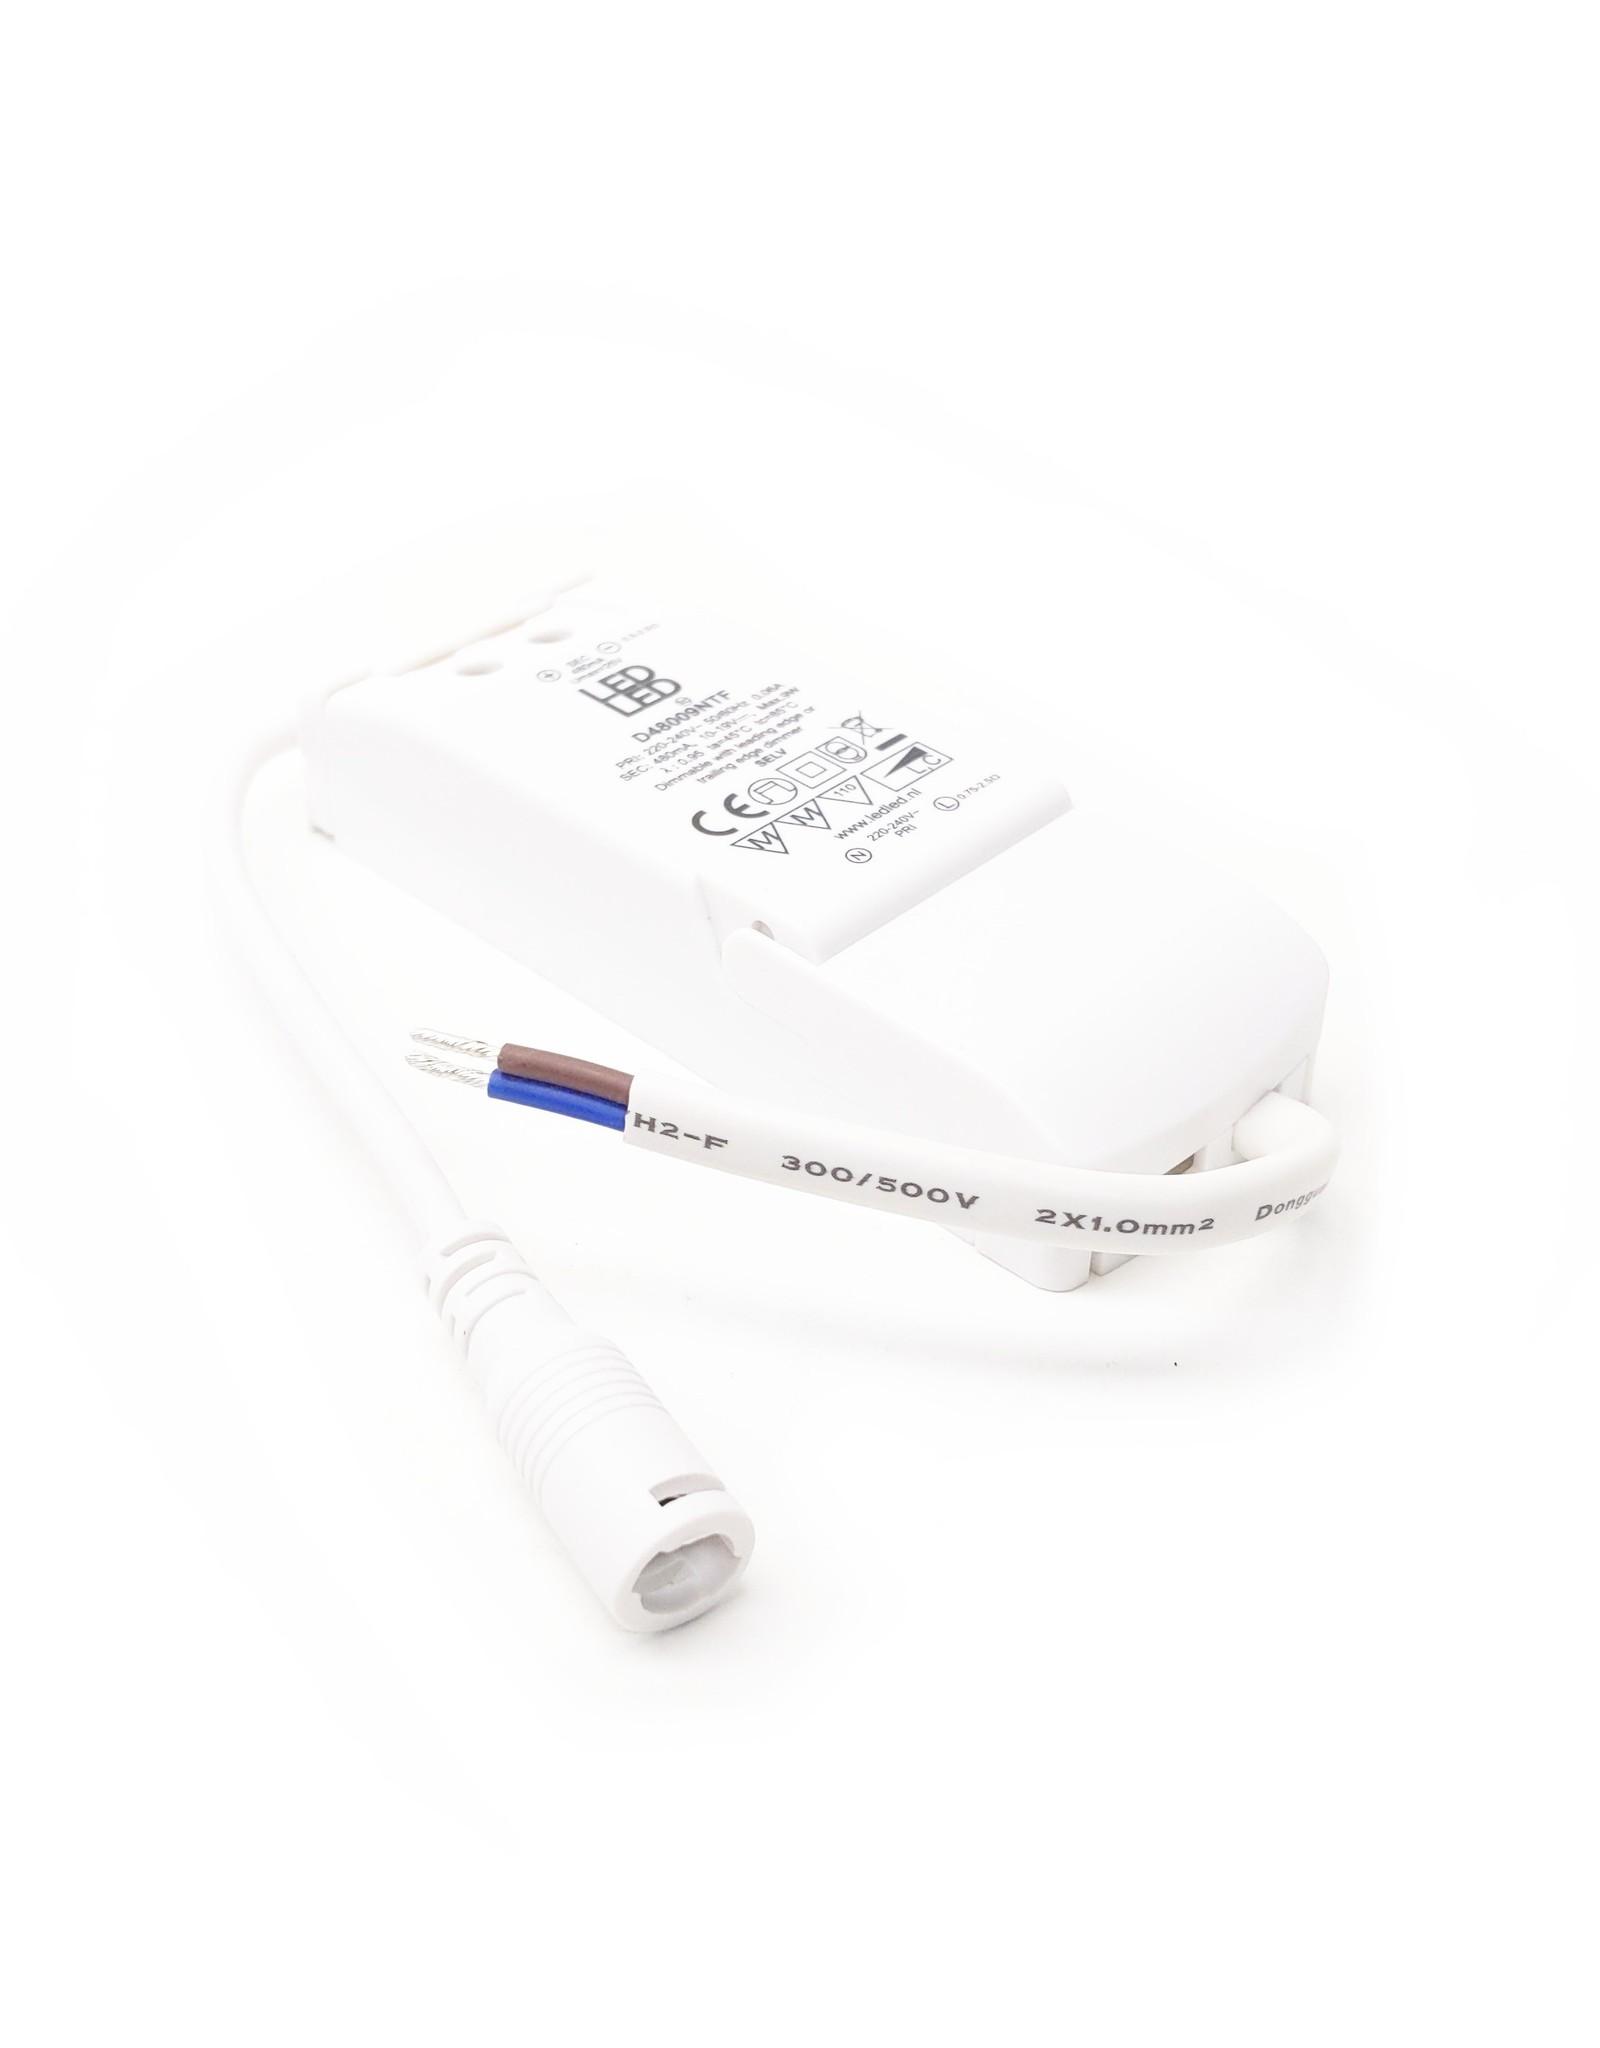 LedLed Addy led kantelspot rond wit dimbaar - Interieur lens